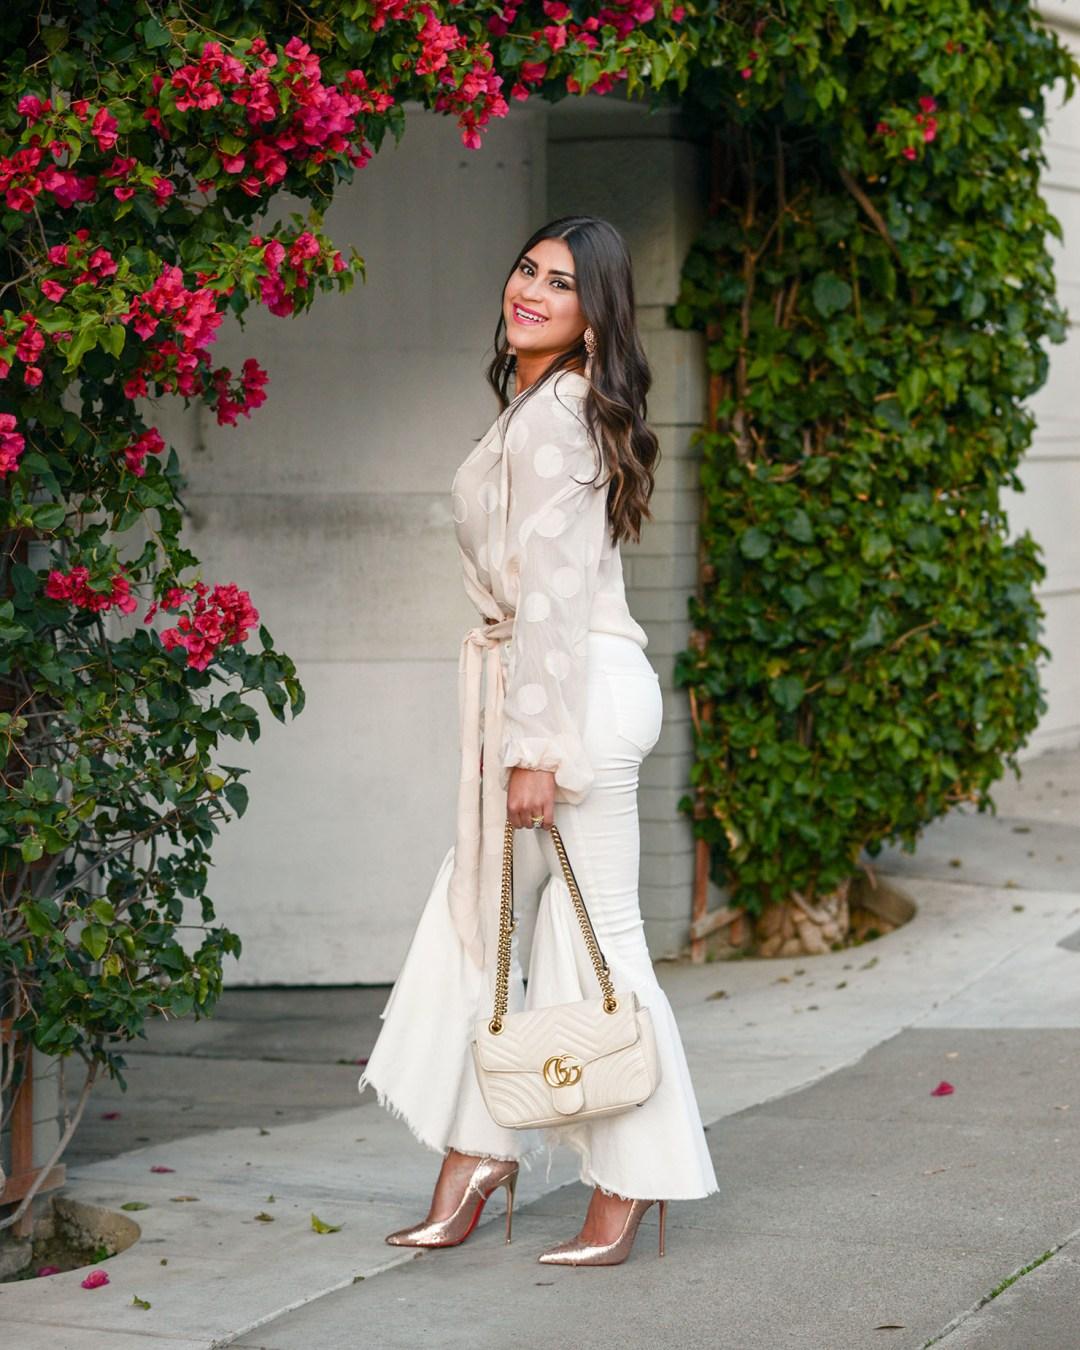 lifestyle blogger Kelsey Kaplan of Kelsey Kaplan Fashion wearing neutral outfit and sequin Christian Louboutin stilettos